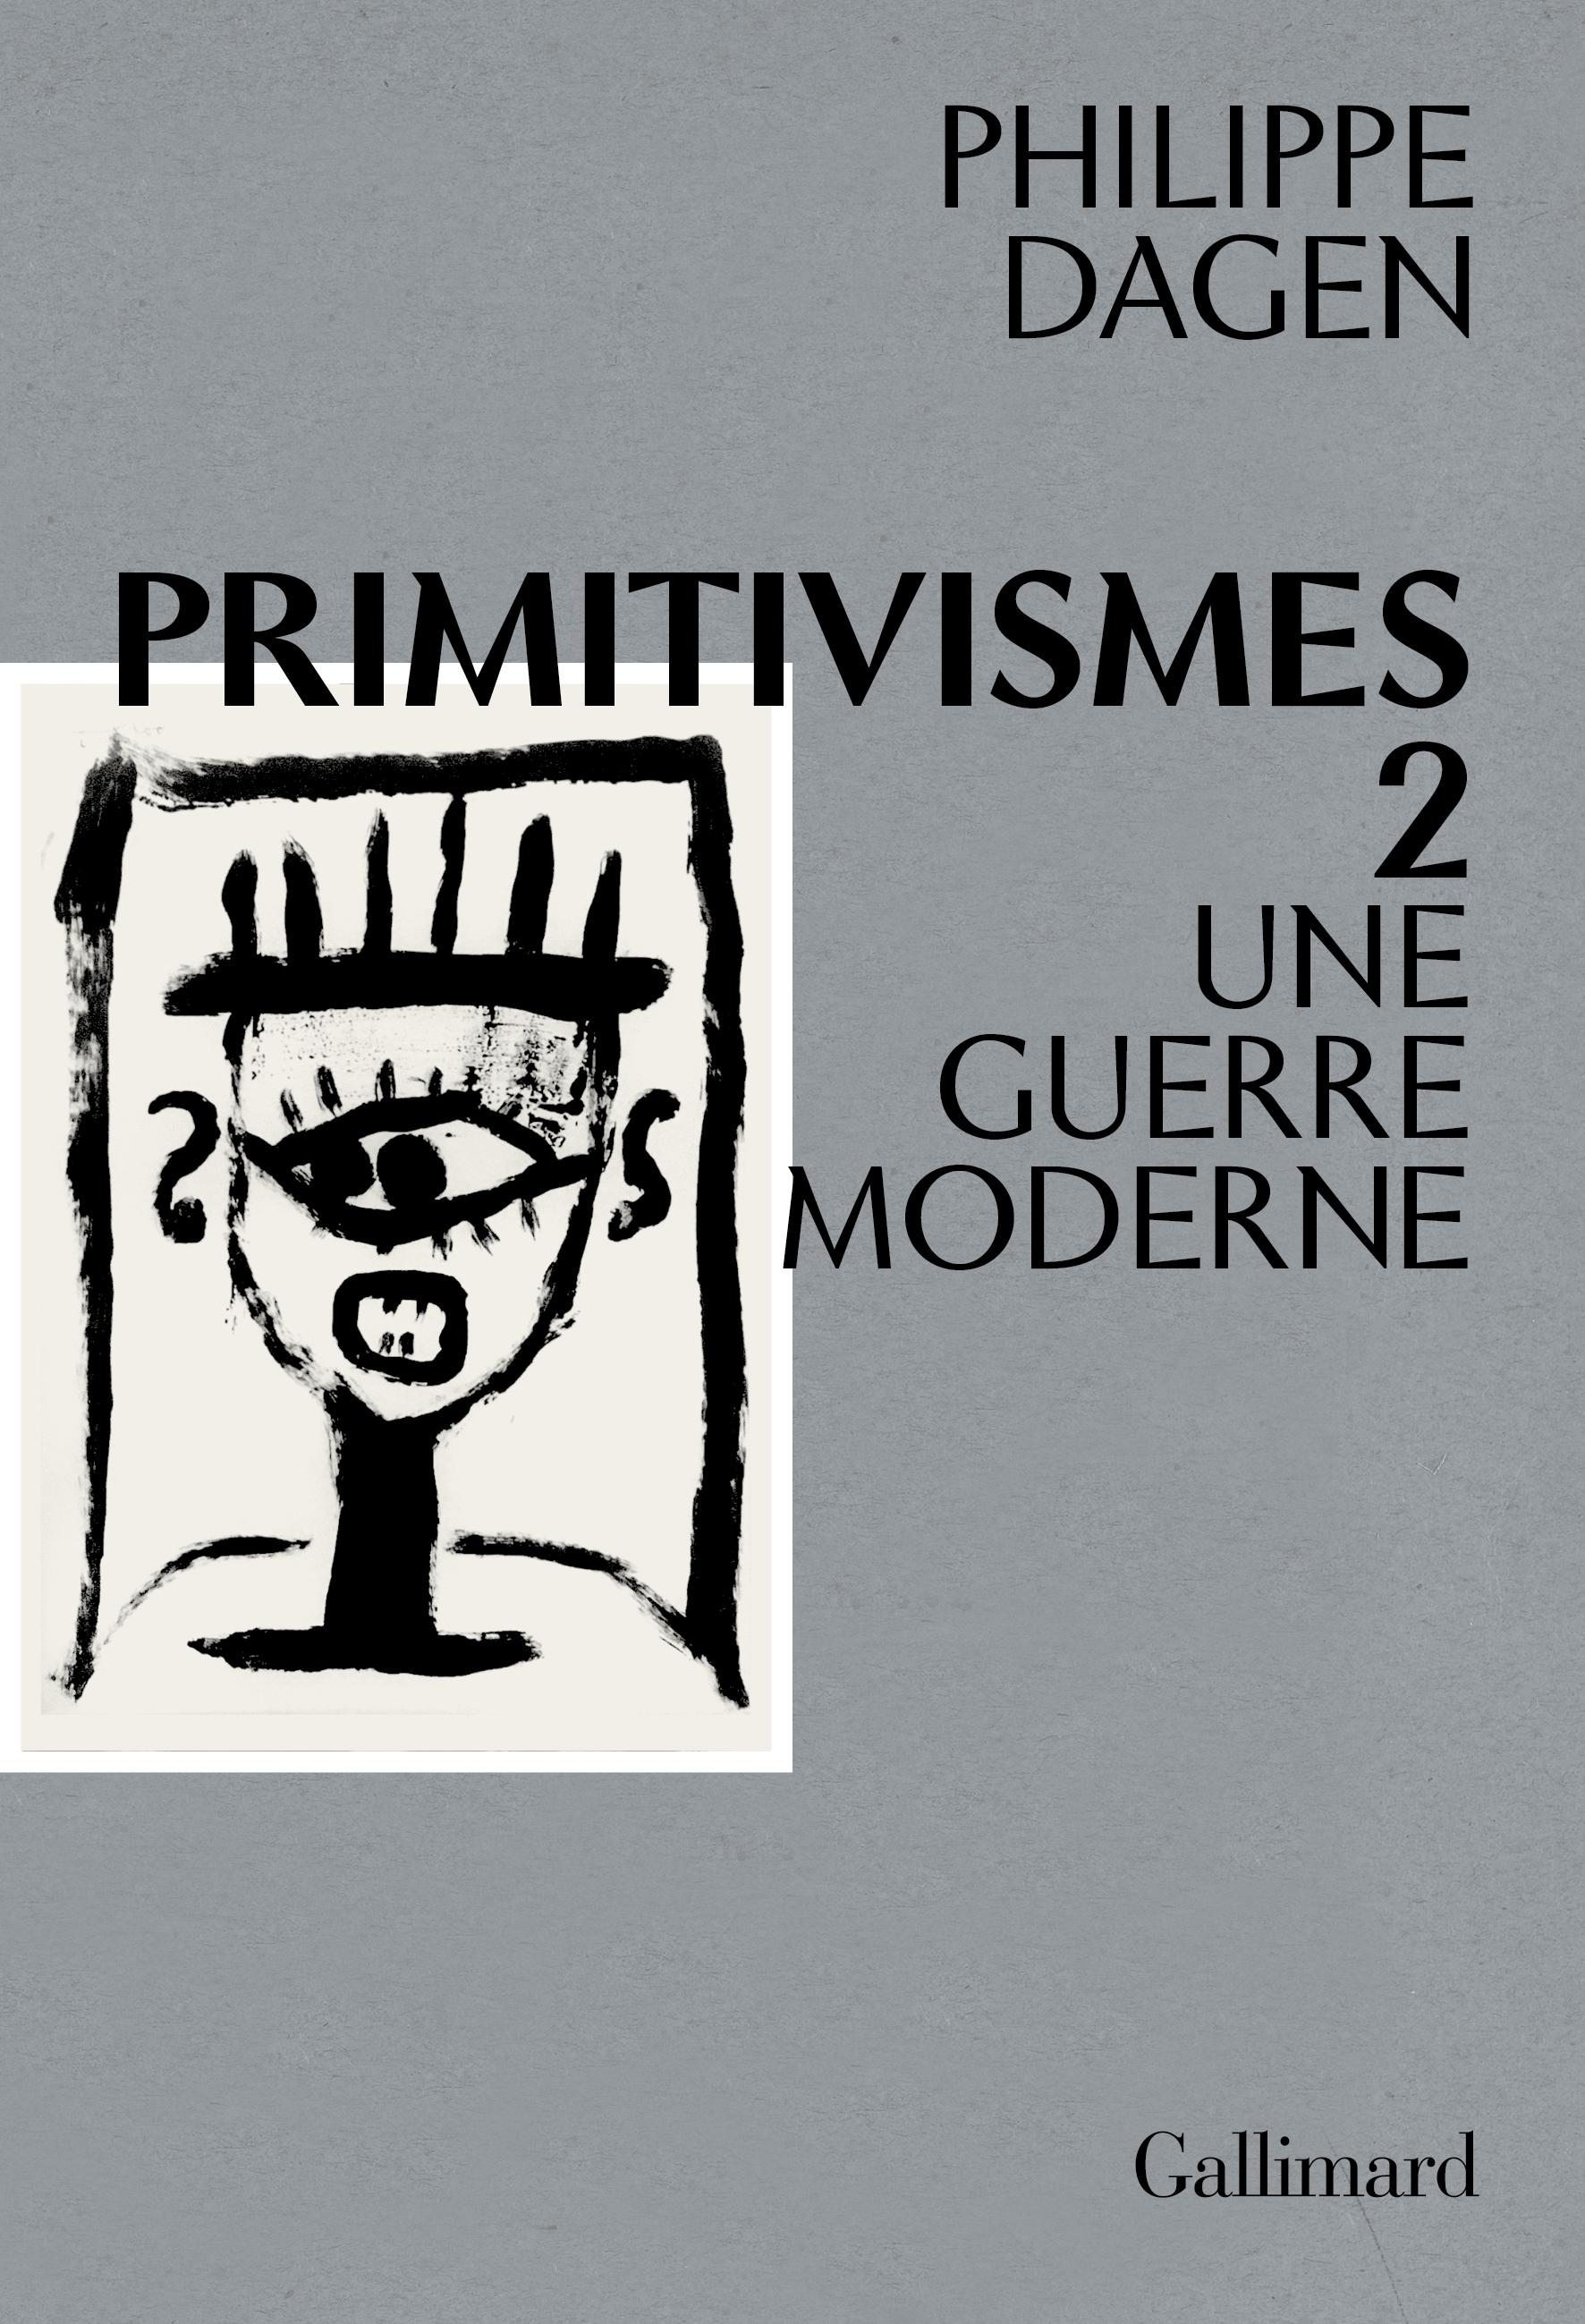 Primitivismes